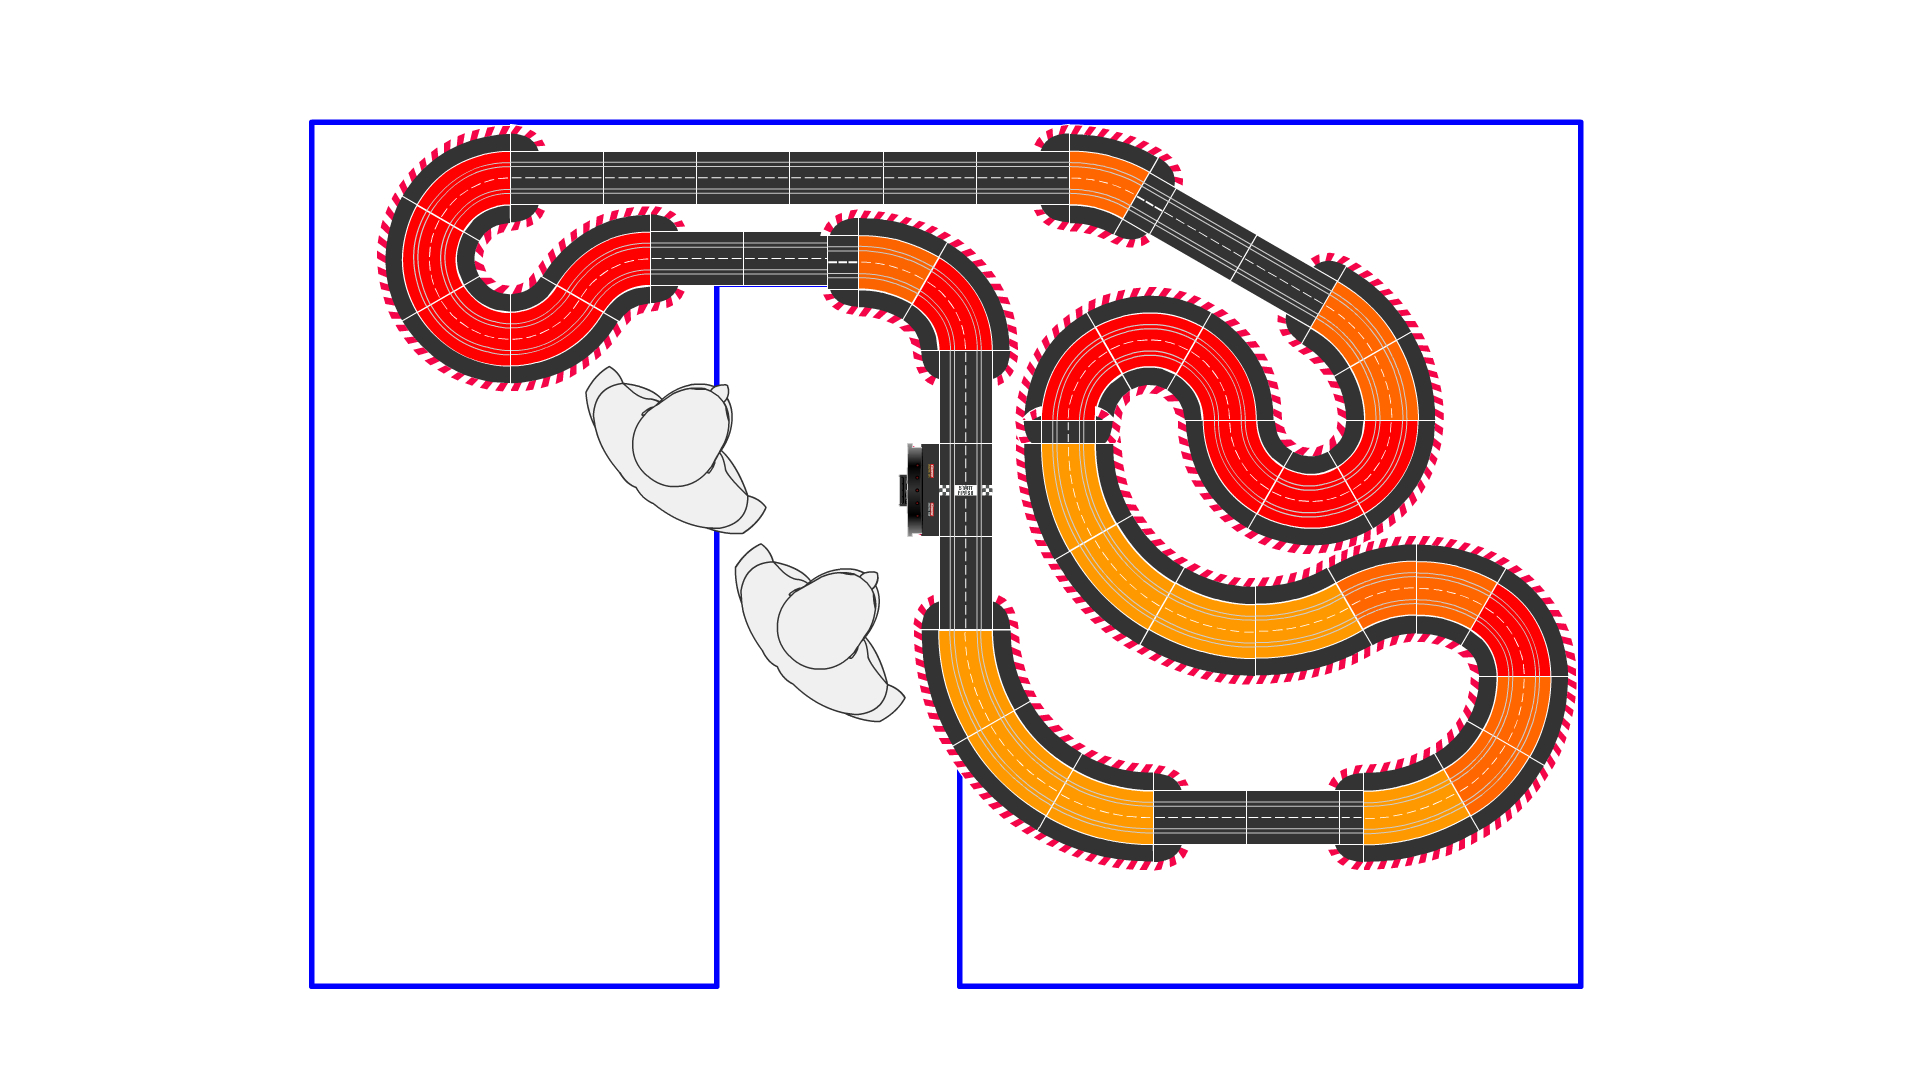 Layout mit speziellen Maßen gesucht - Bahnplanung - freeslotter